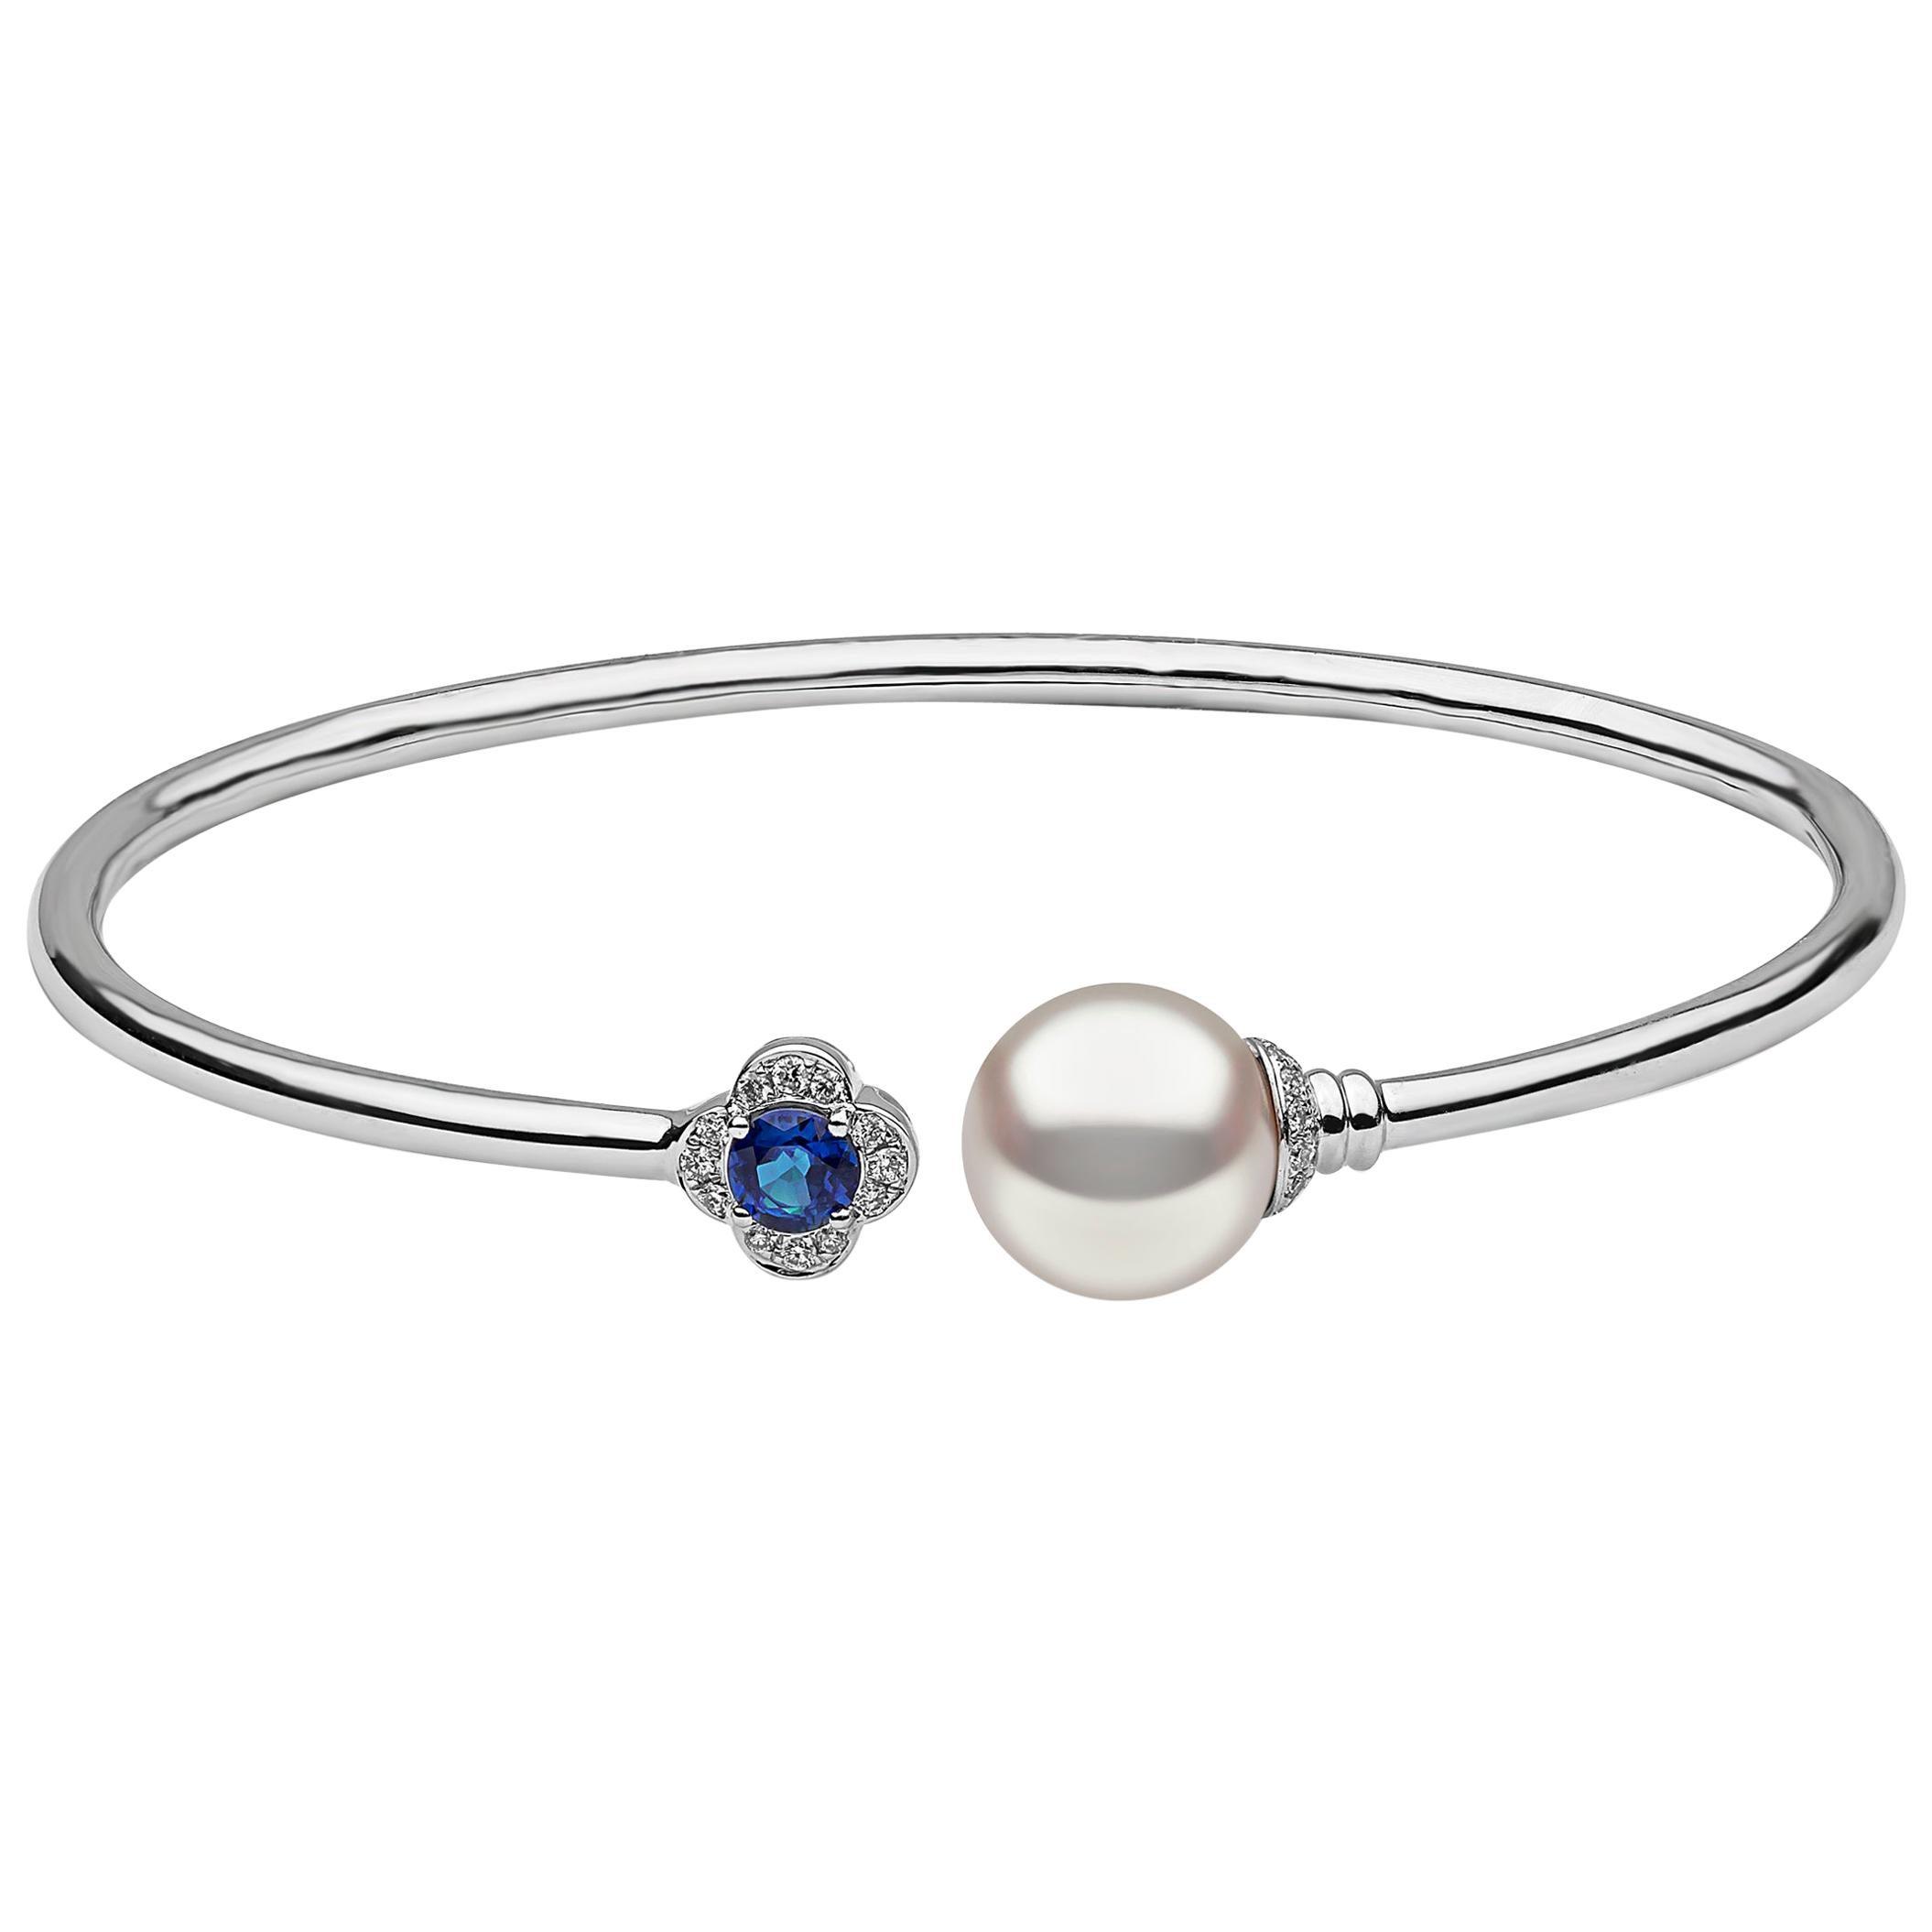 Yoko London Blue Sapphire, Diamond and Pearl Bangle in 18 Karat White Gold